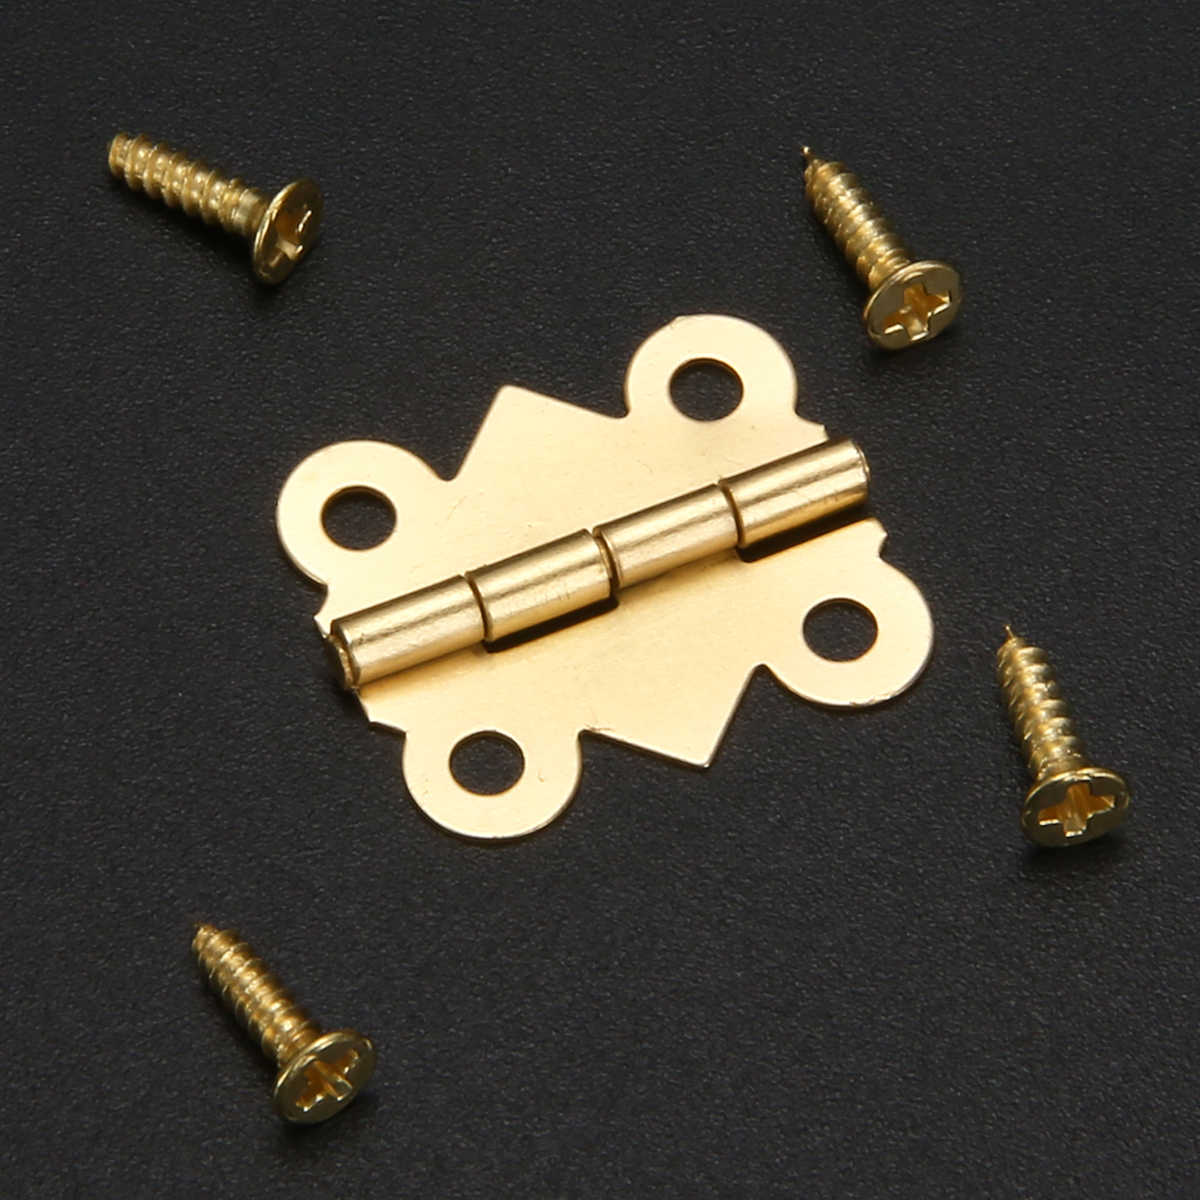 10 Buah/Set Mini Butterfly Besi Engsel Kabinet Laci Pintu Engsel Kotak Perhiasan DIY Alat dengan Sekrup untuk Perangkat Perabot Aksesori